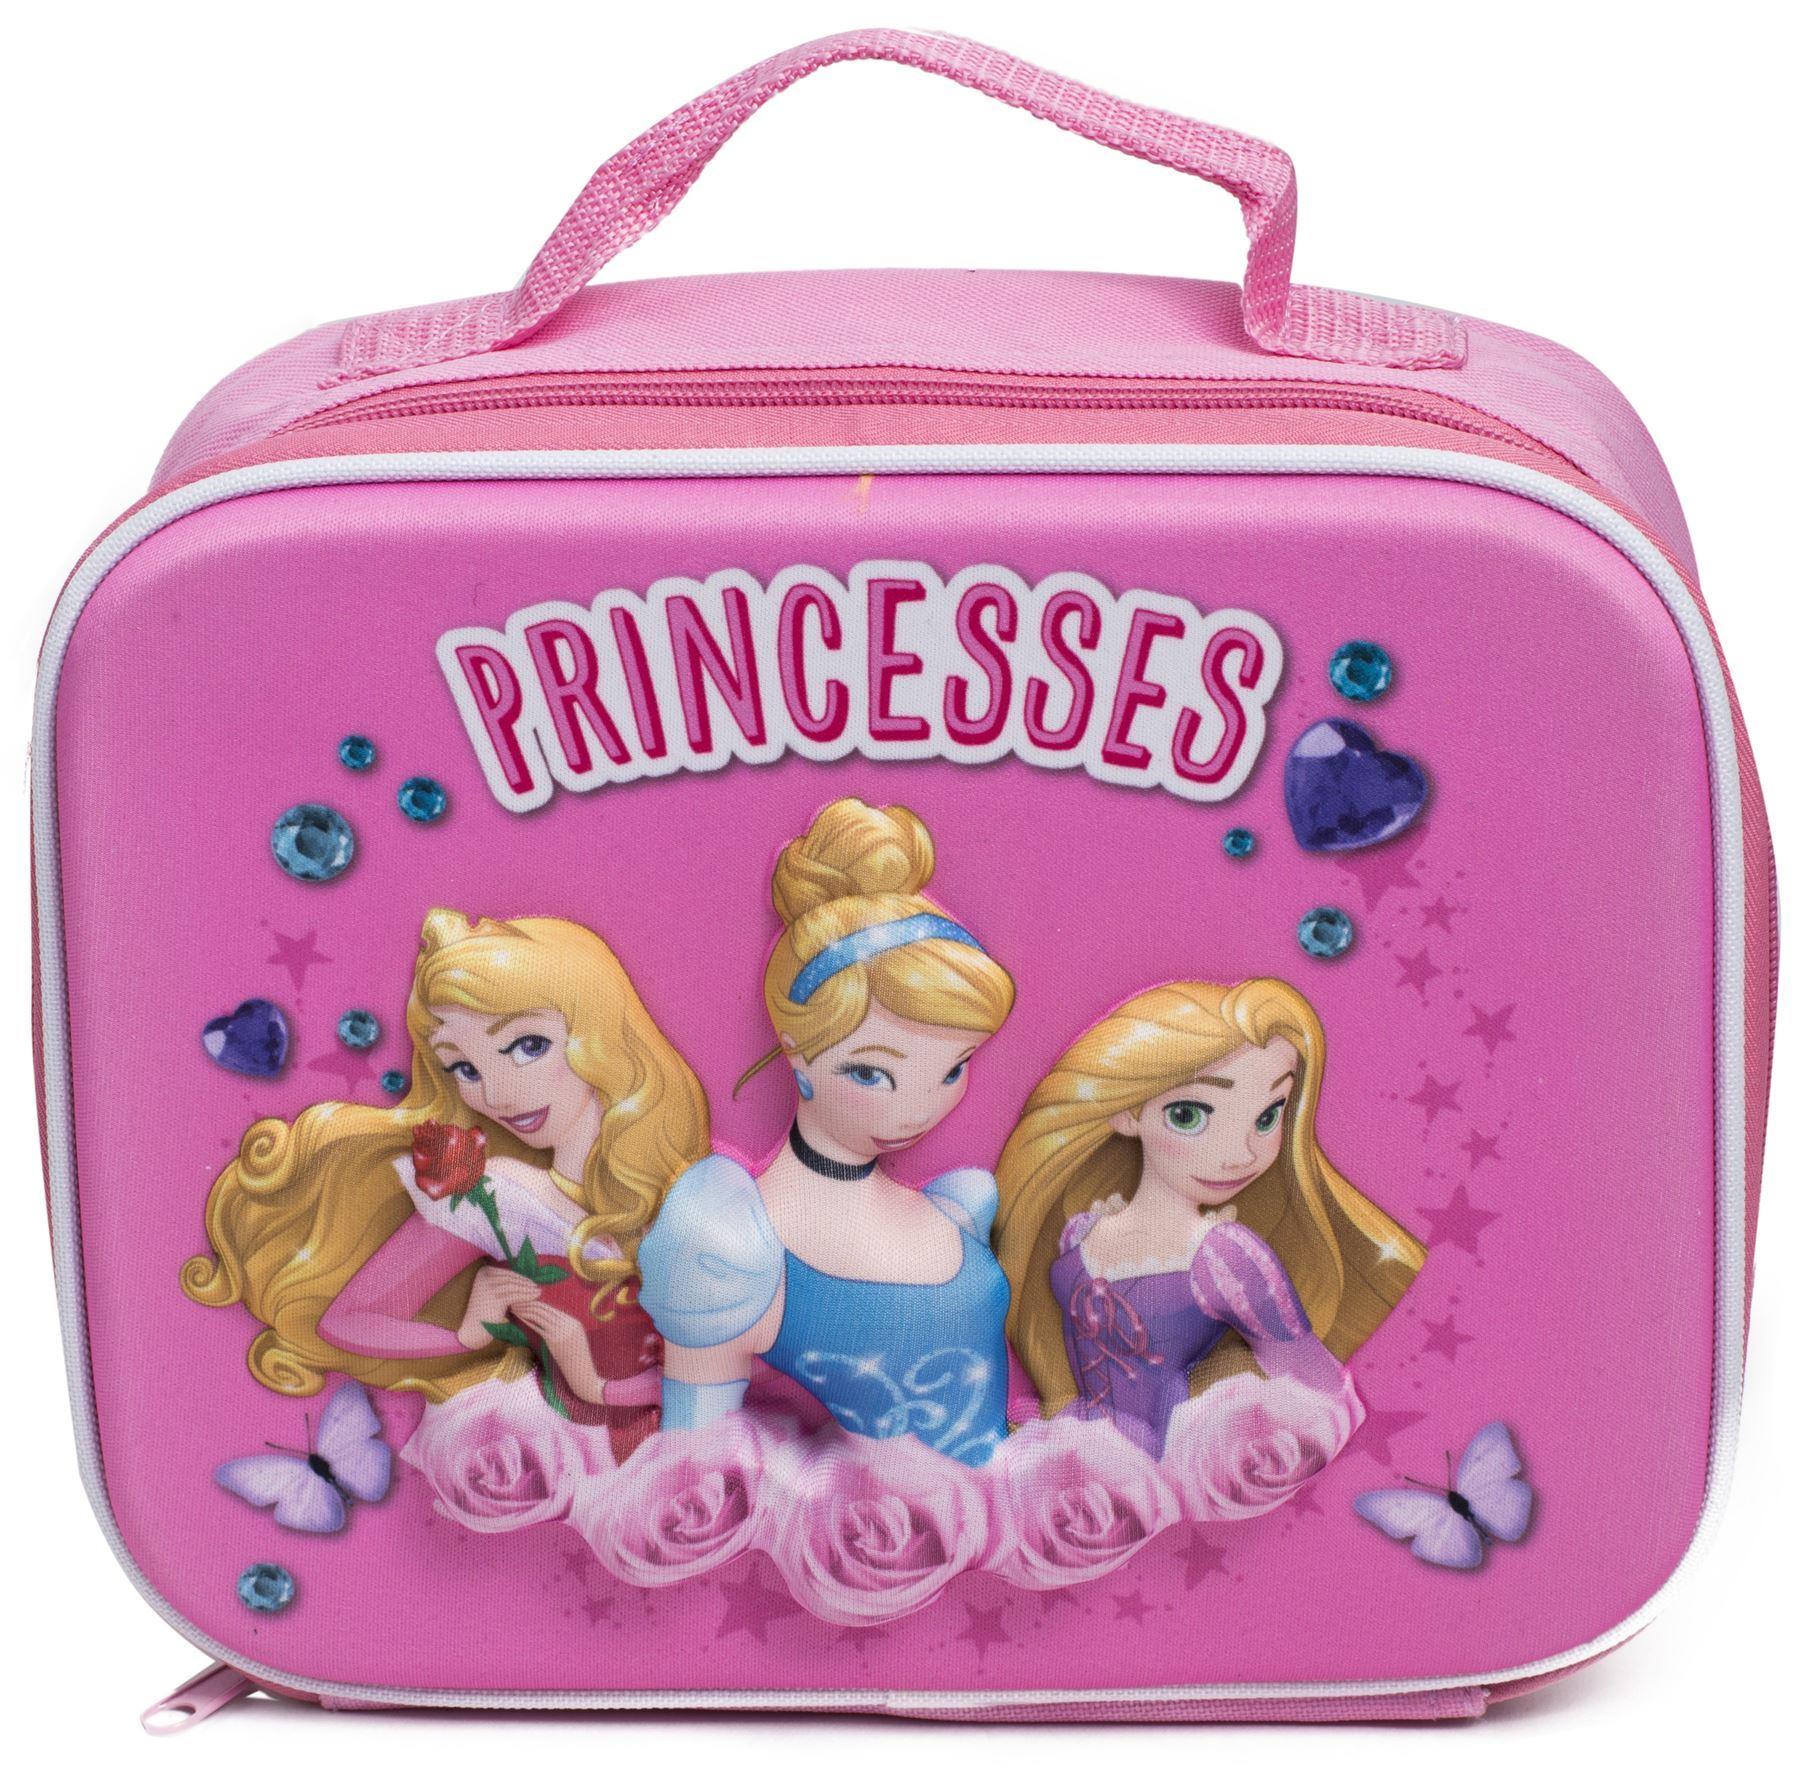 Disney Princess Minnie Mouse Doc McStuffins Backpack Kids Tote ... 64f90f0f53e